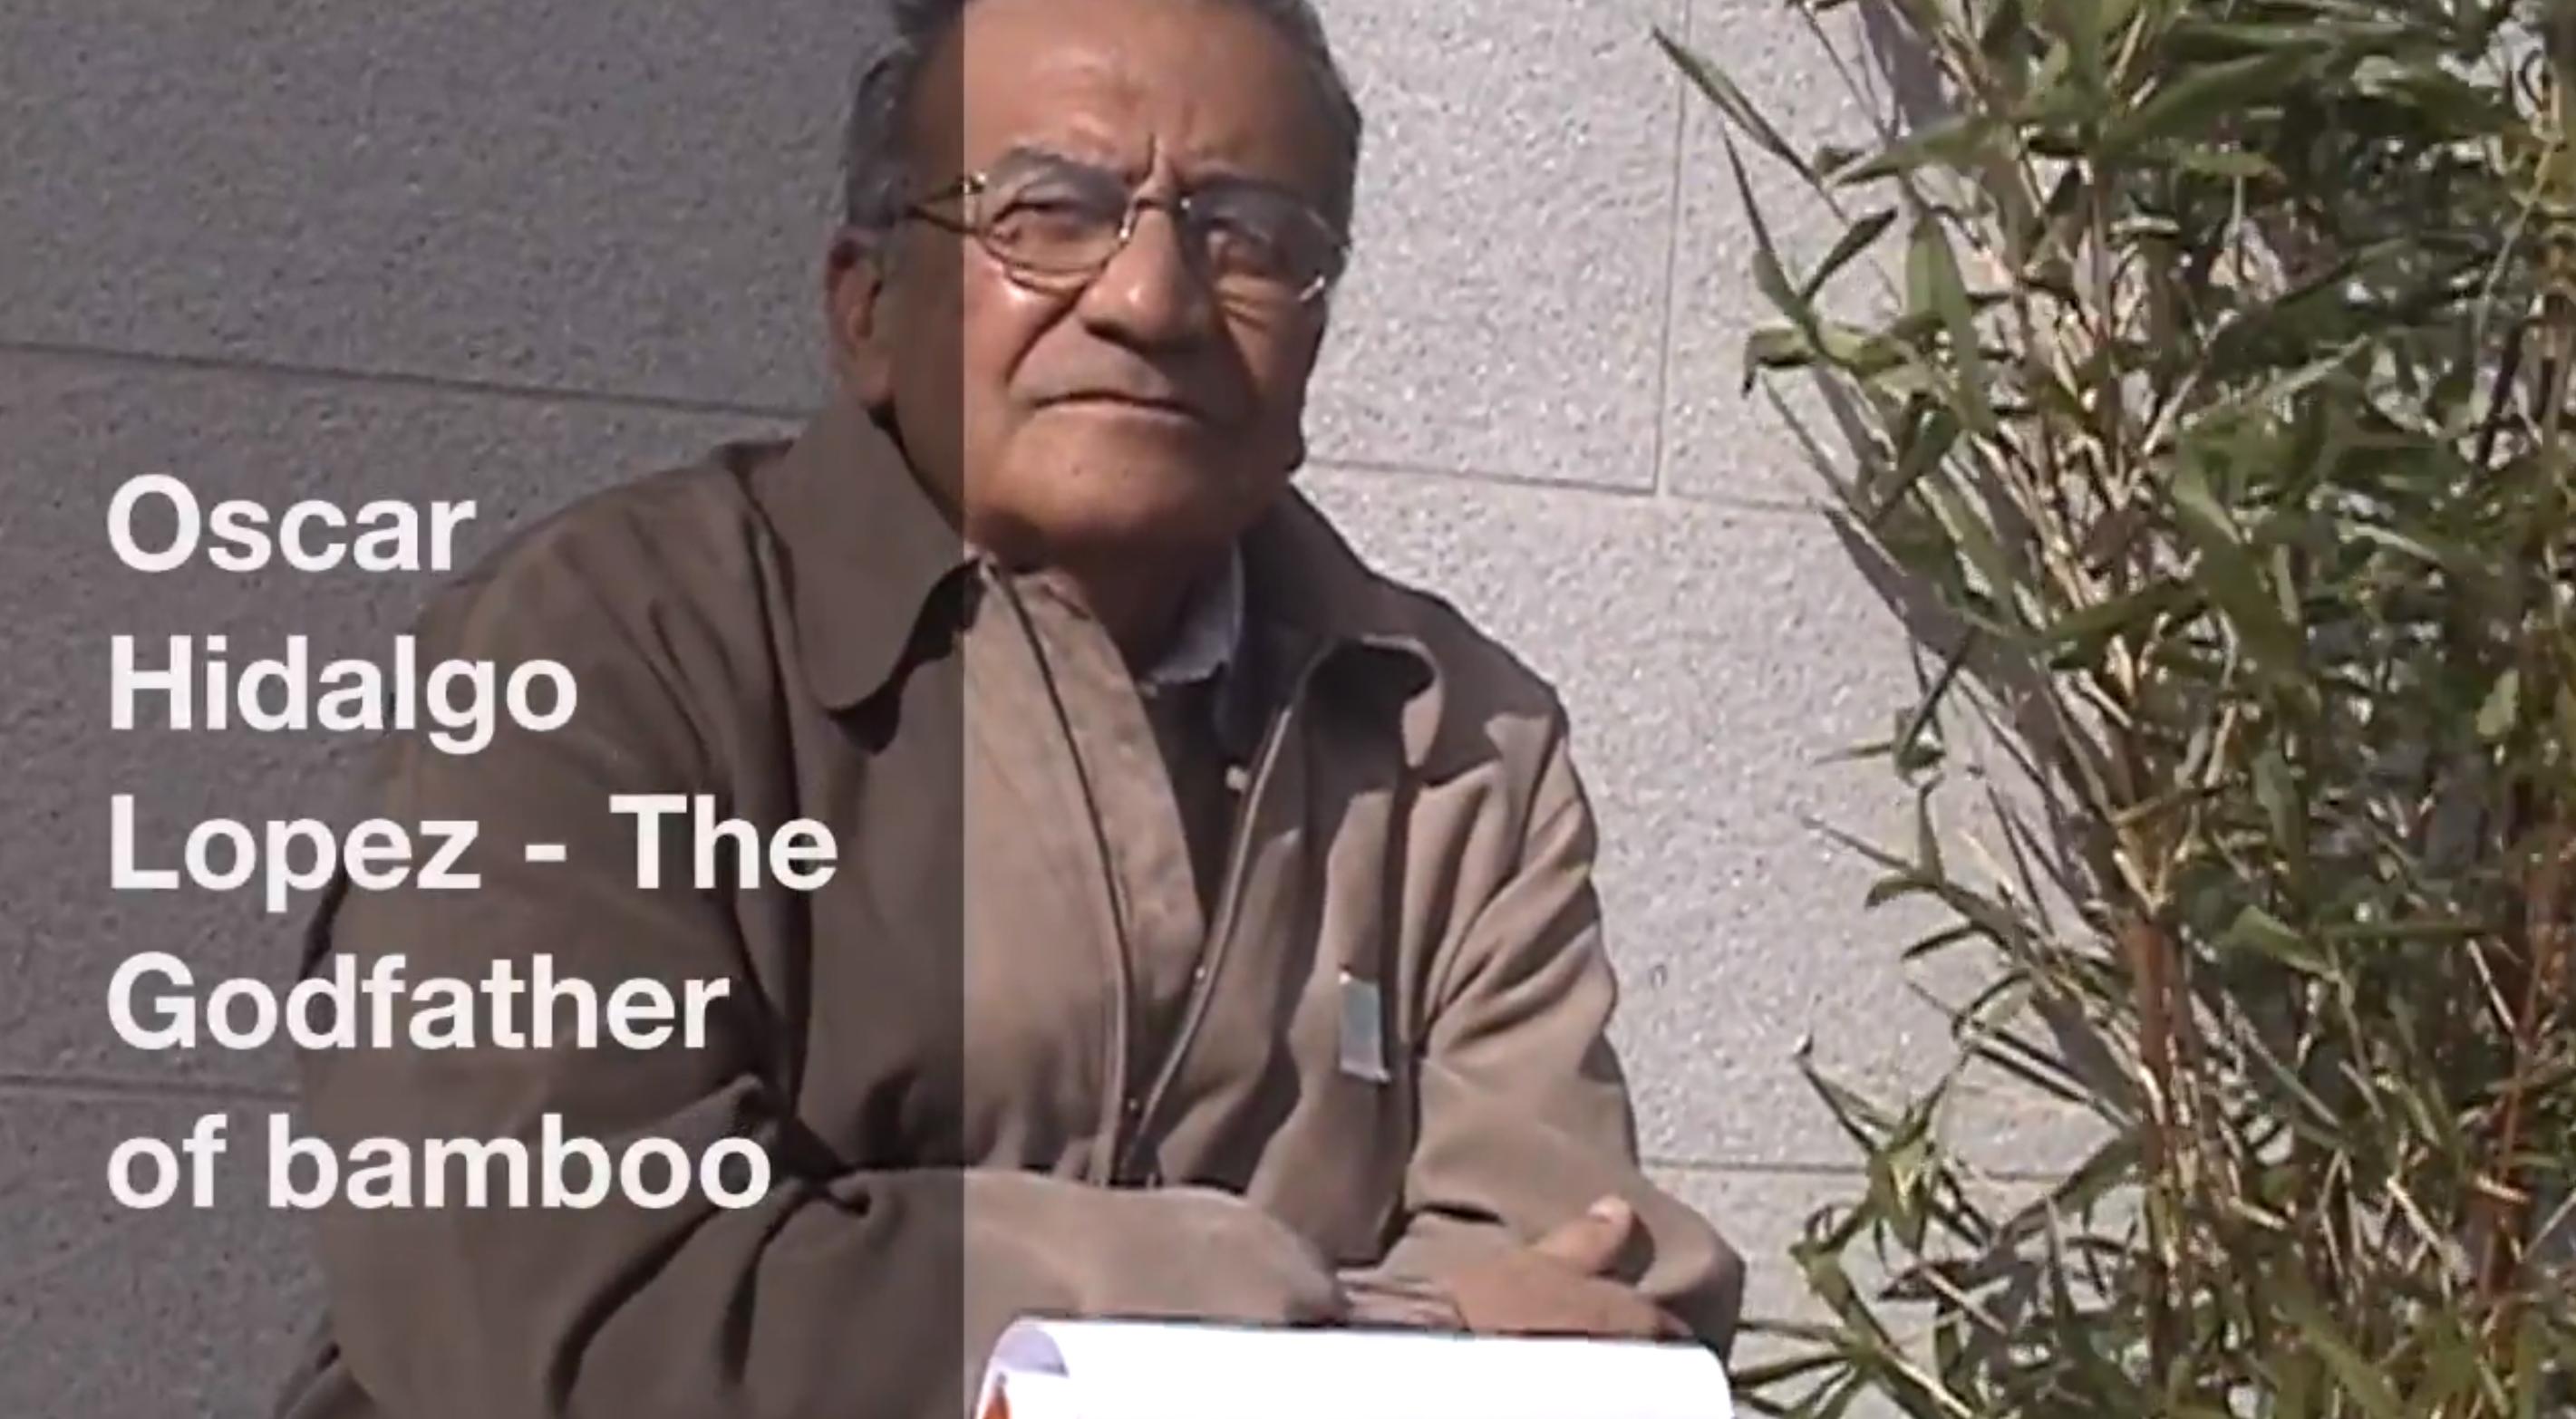 Oscar Hidalgo Lopez- The Godfather of Bamboo